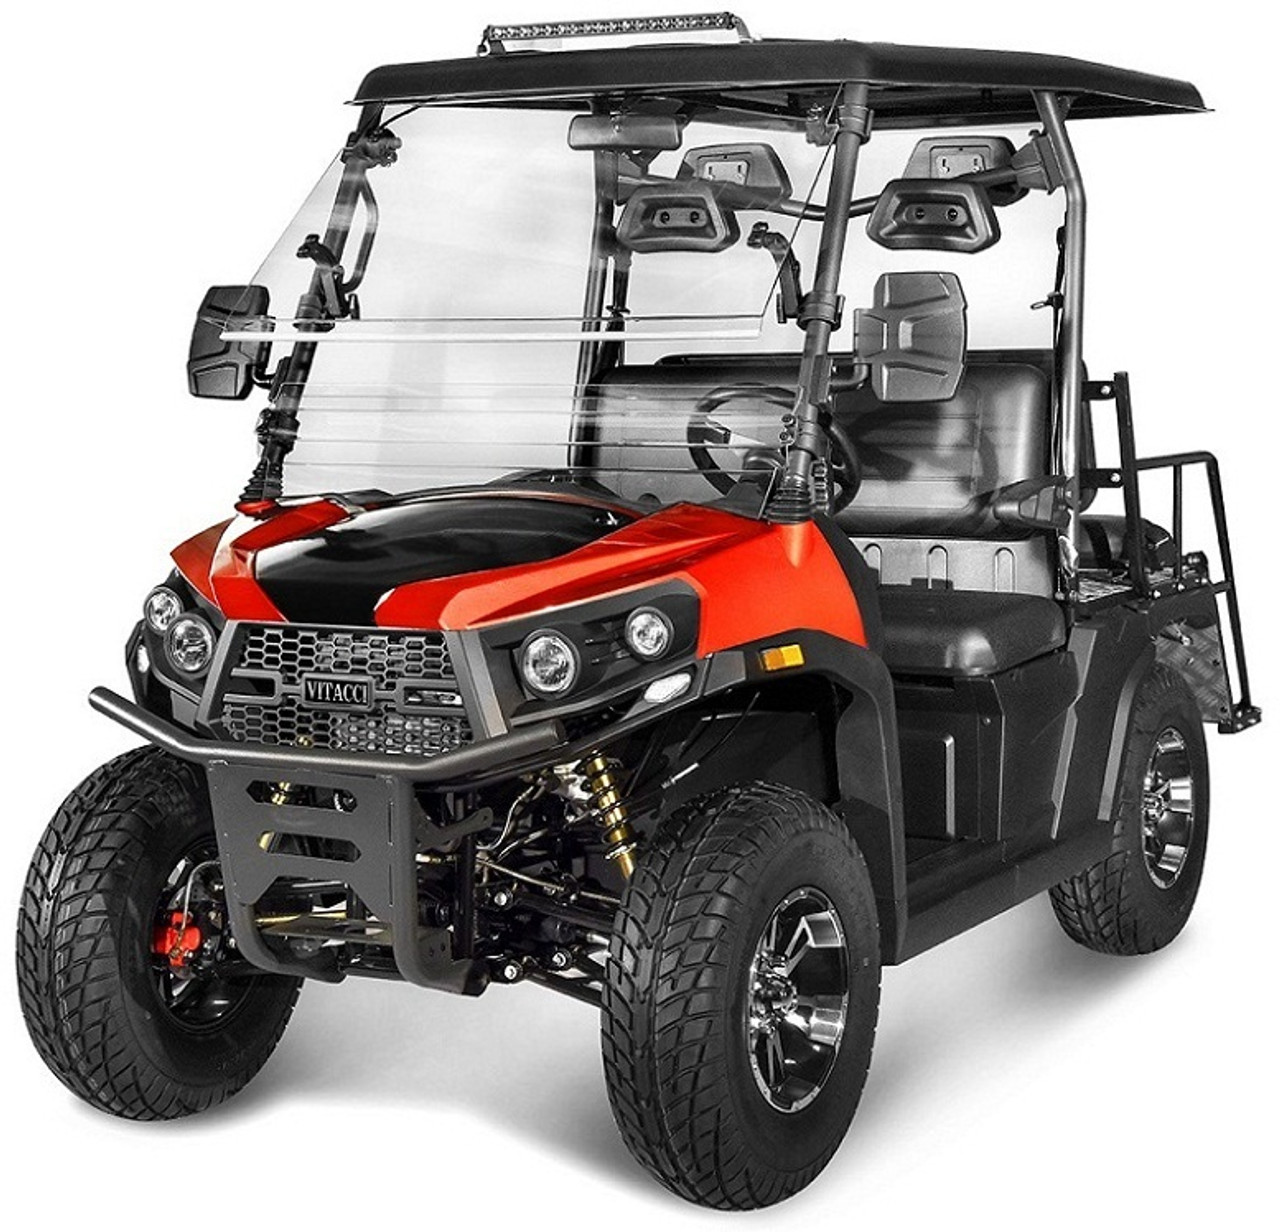 Orange - Vitacci Rover-200 EFI 169cc (Golf Cart) UTV, 4-stroke, Single-cylinder, Oil-cooled